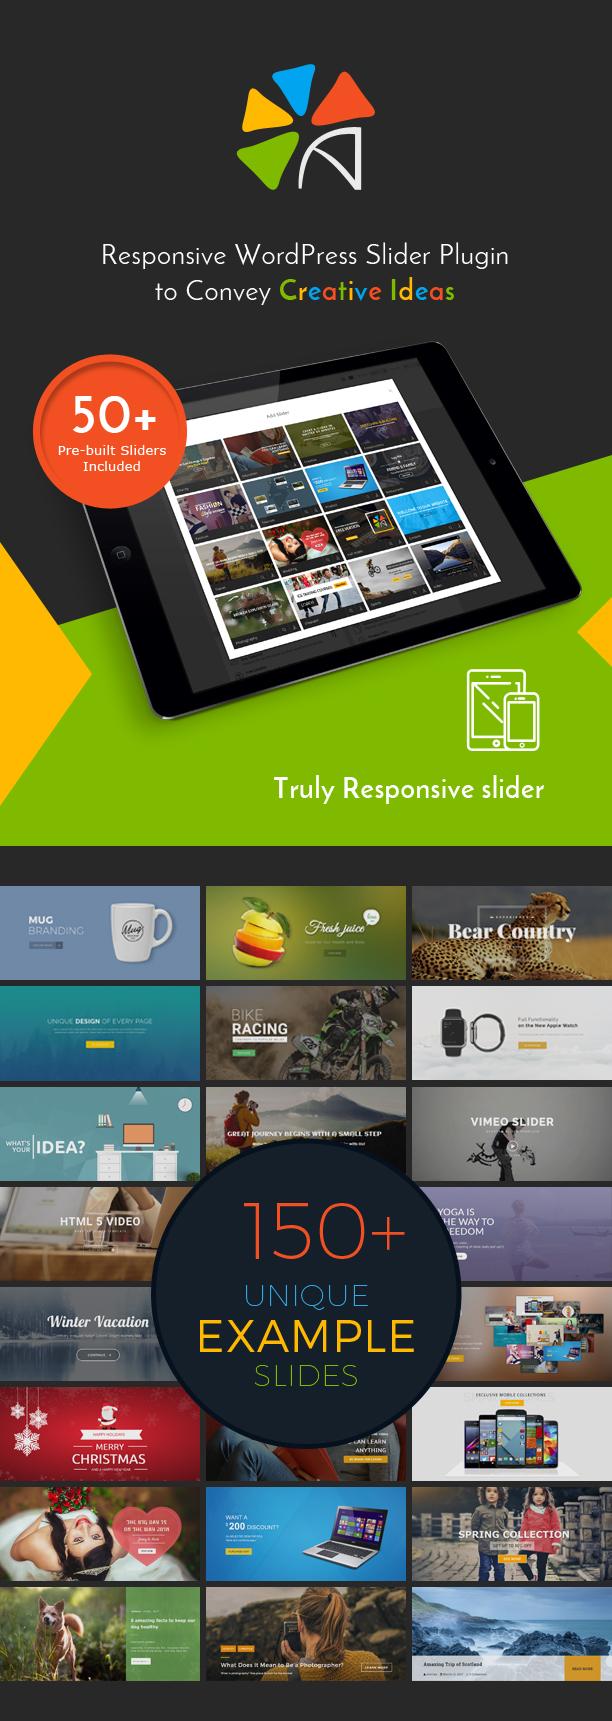 Best responsive WordPress slider plugin - Avartan slider